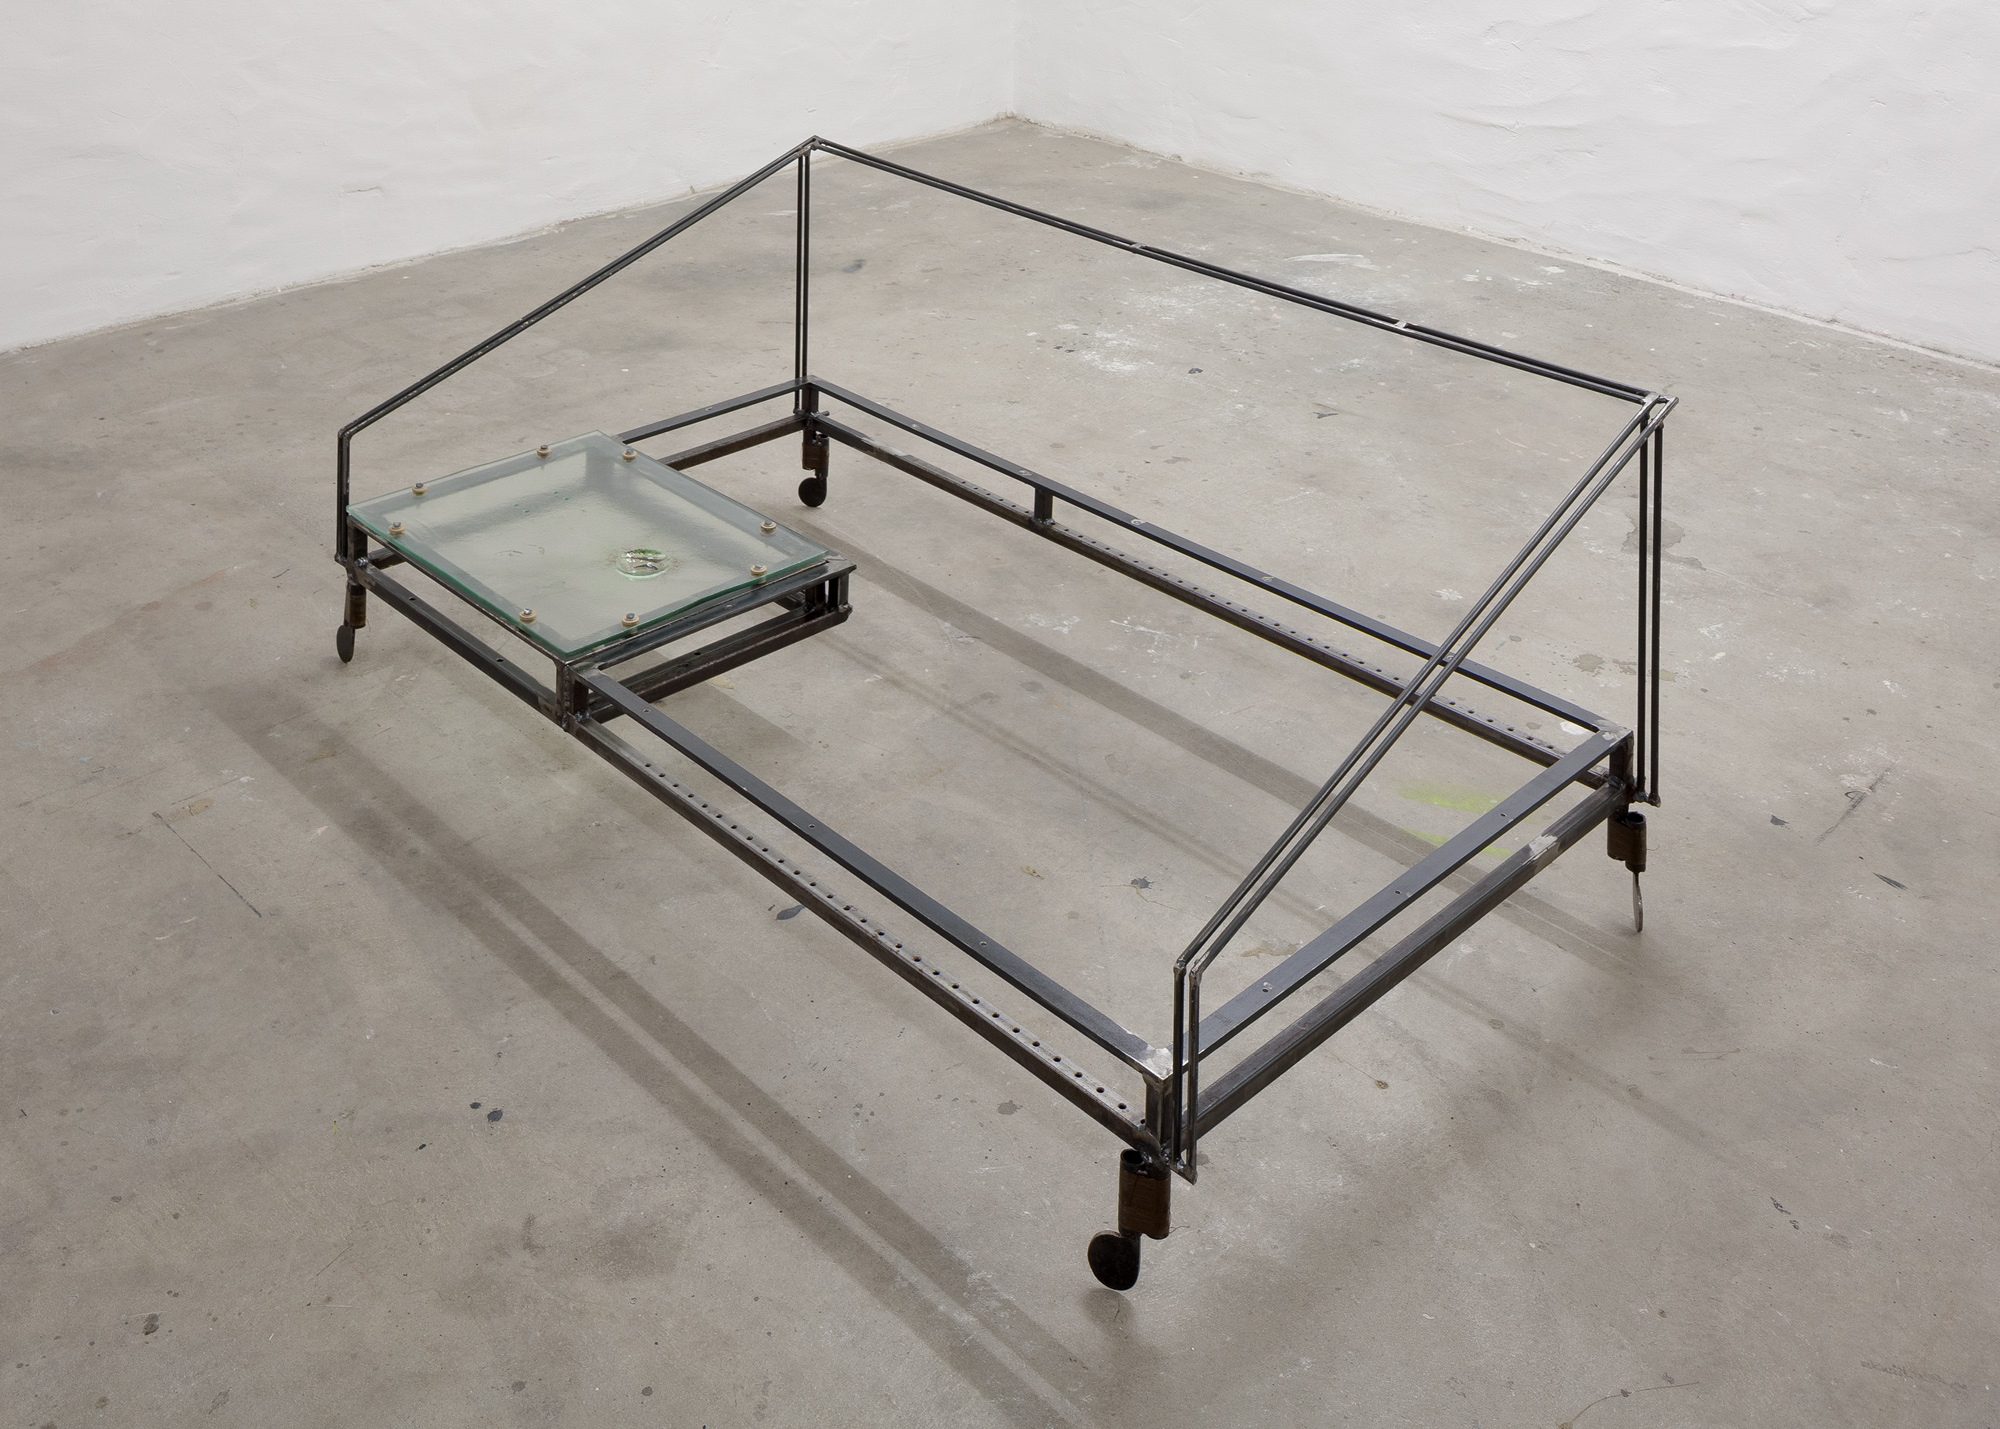 table (glass) │ metal, glass │ 2016-19 │ 40cm x 145cm x 107cm